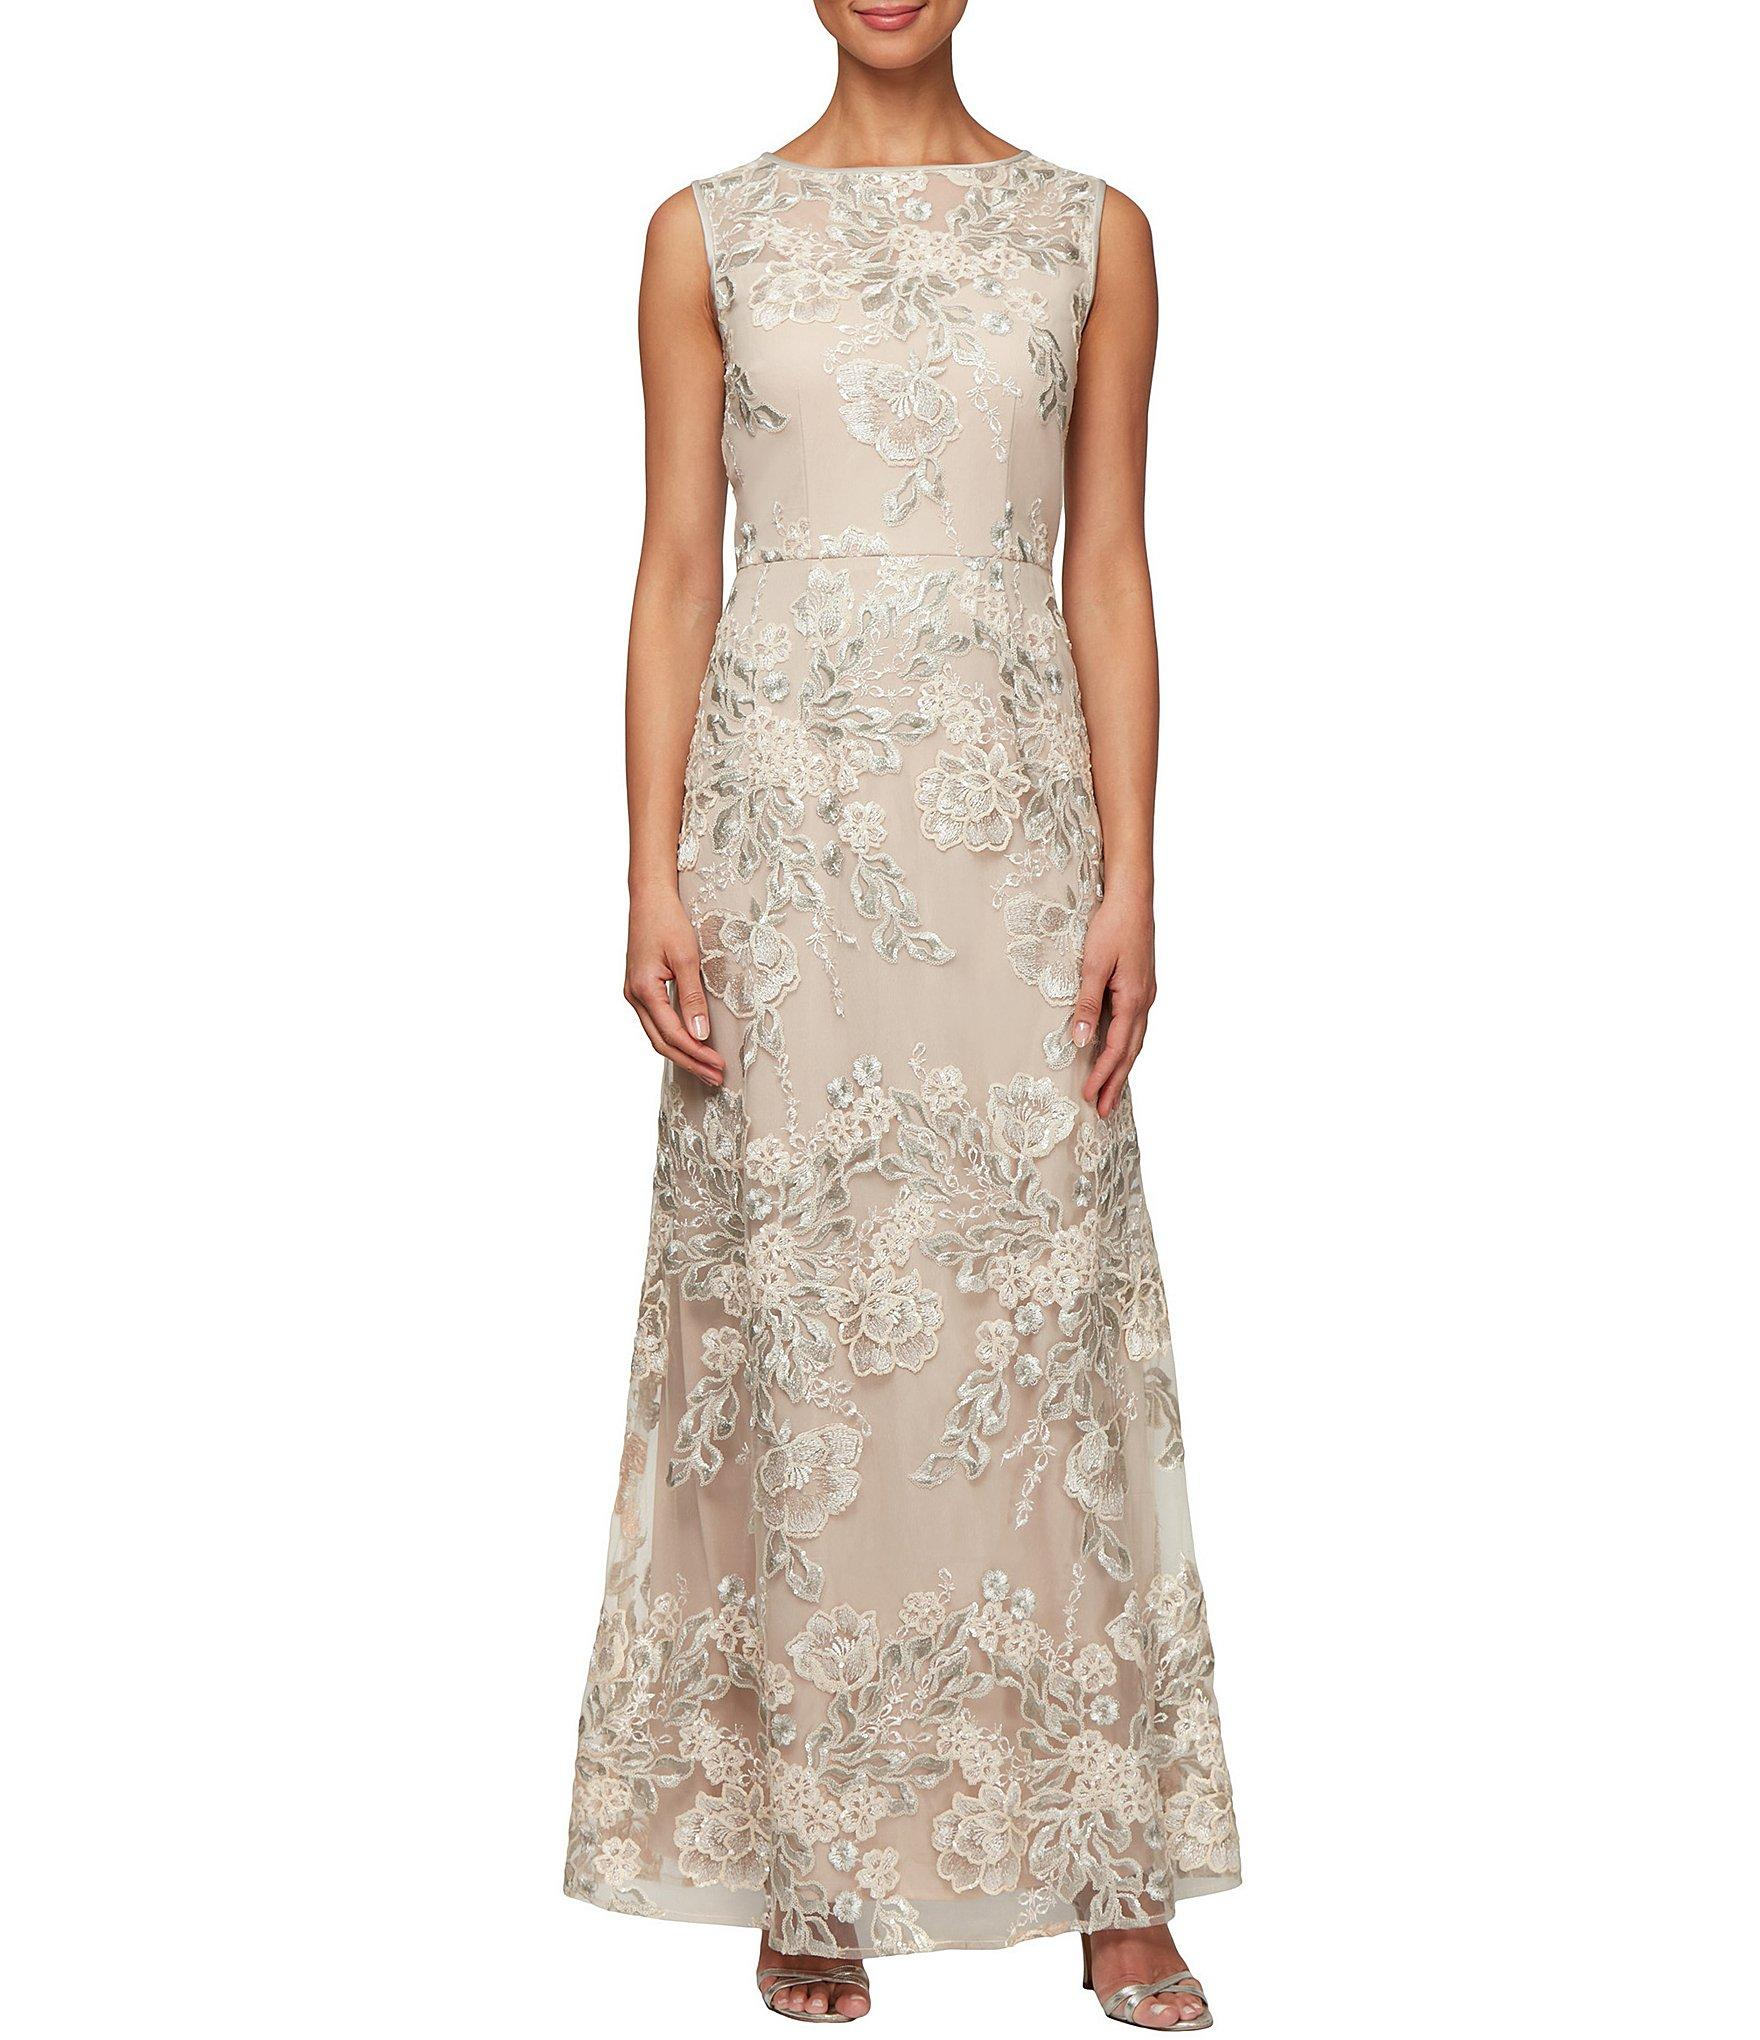 8b4d63c700 Alex Evenings. Women s Natural Floral Embroidered Sleeveless A-line Dress